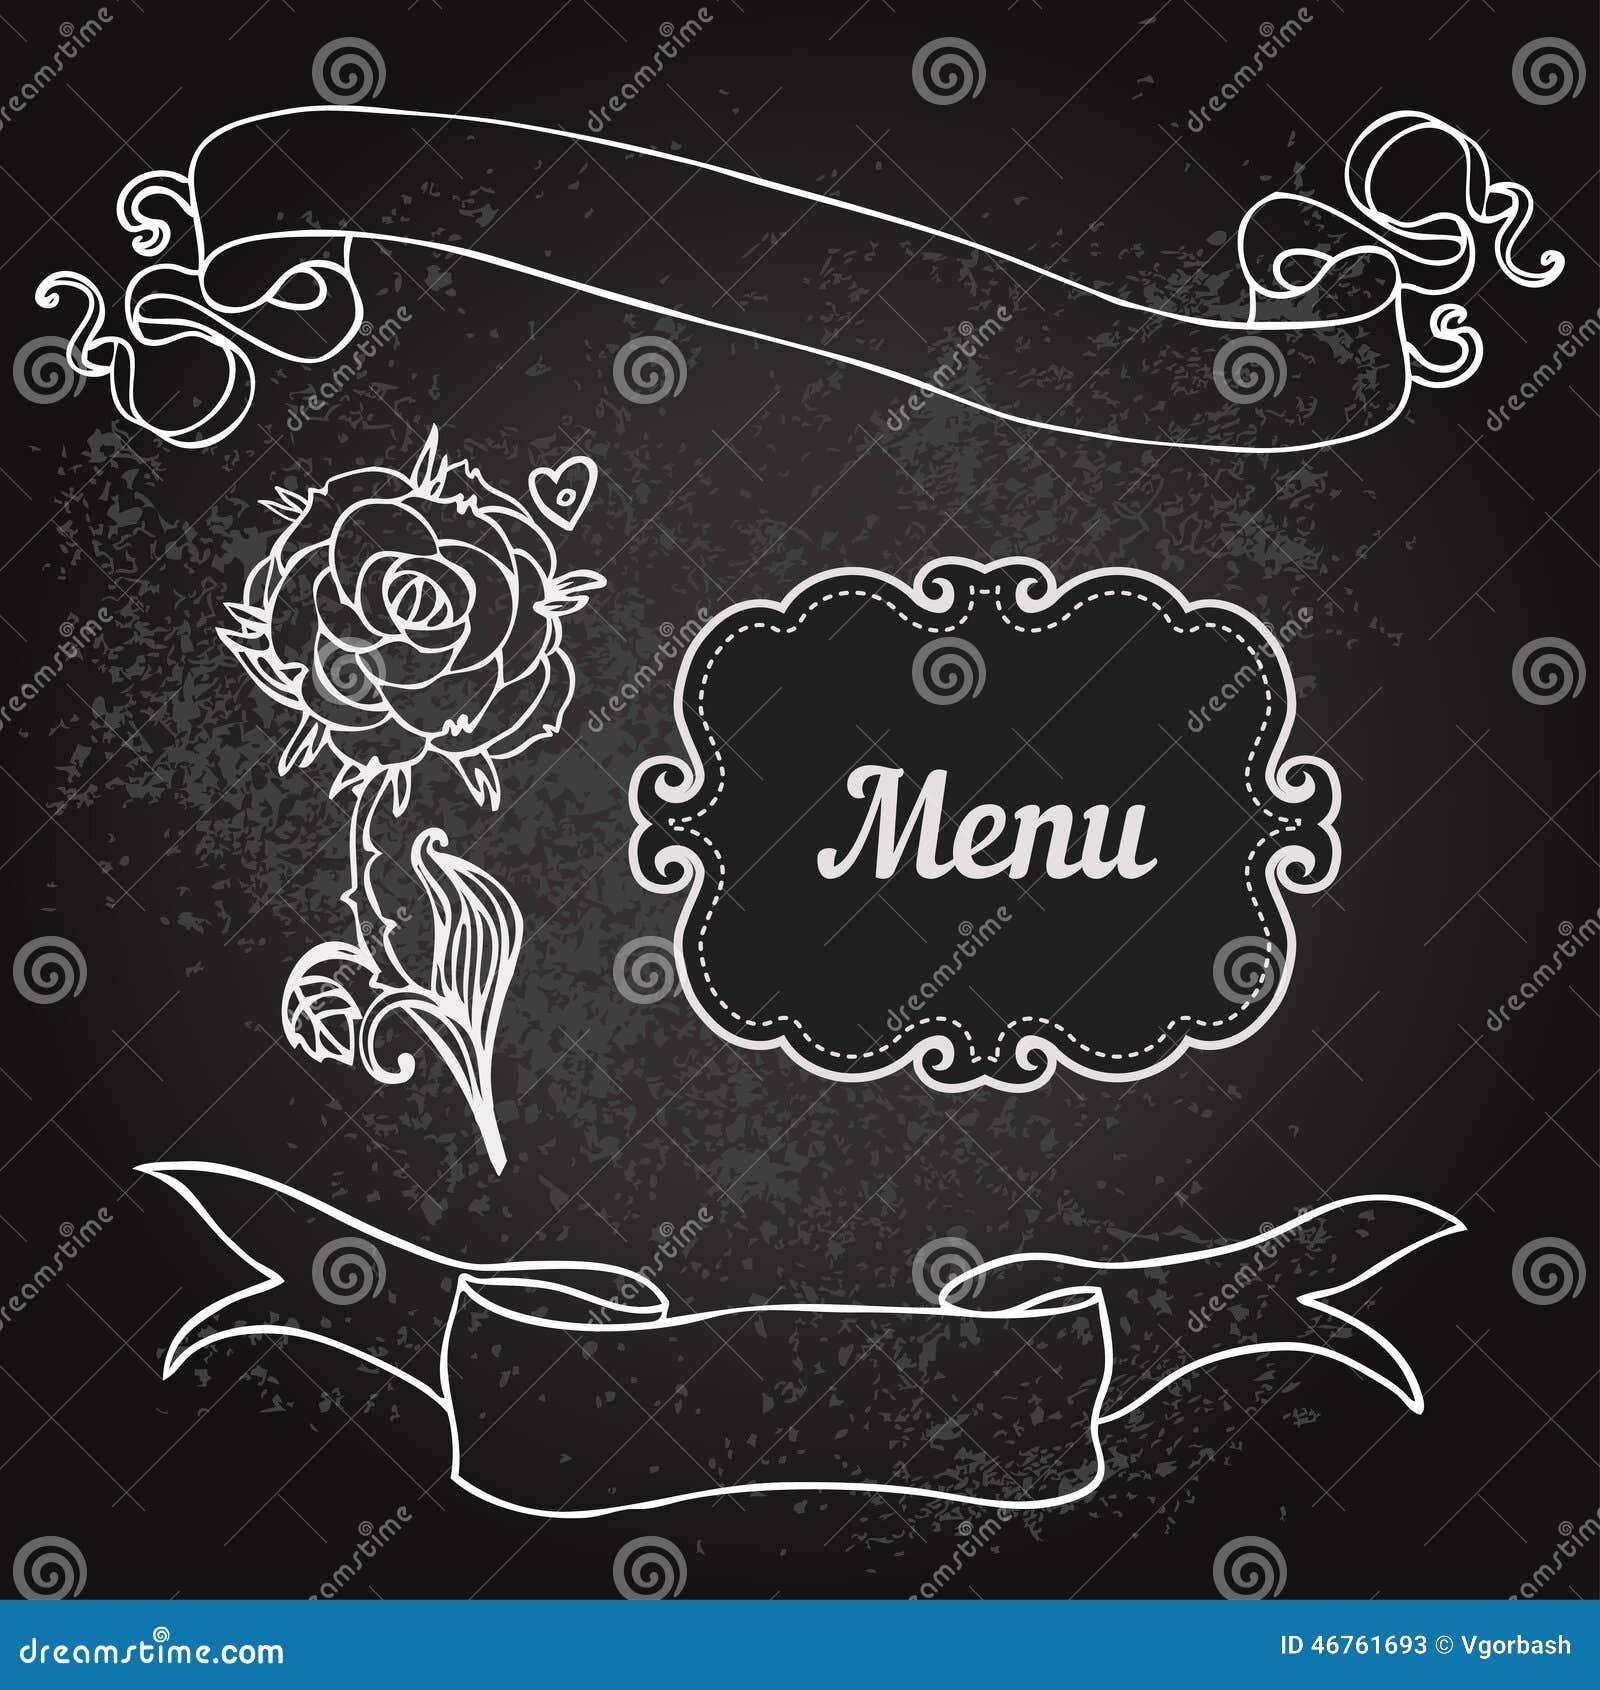 Vector Illustration Of Floral Design On Blackboard Stock